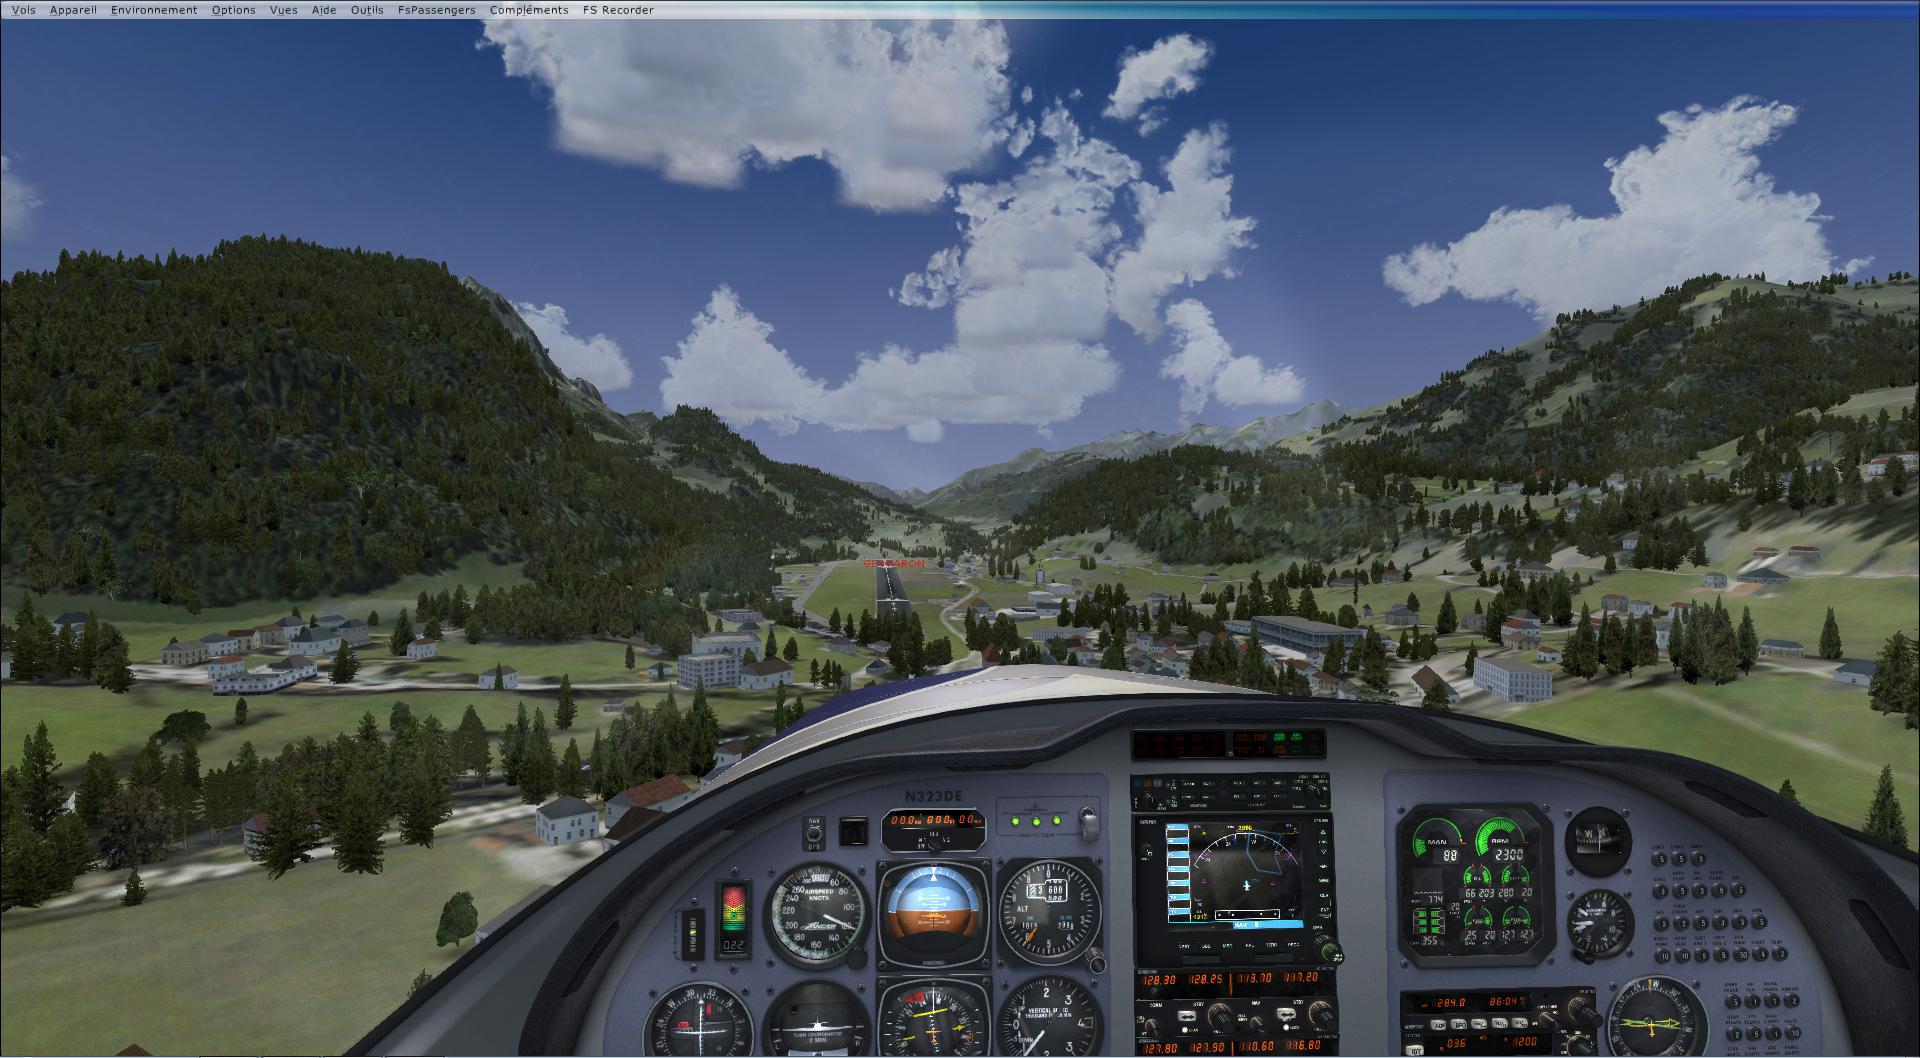 Essai demo X-Plane 10 - Page 2 728322201384174633463